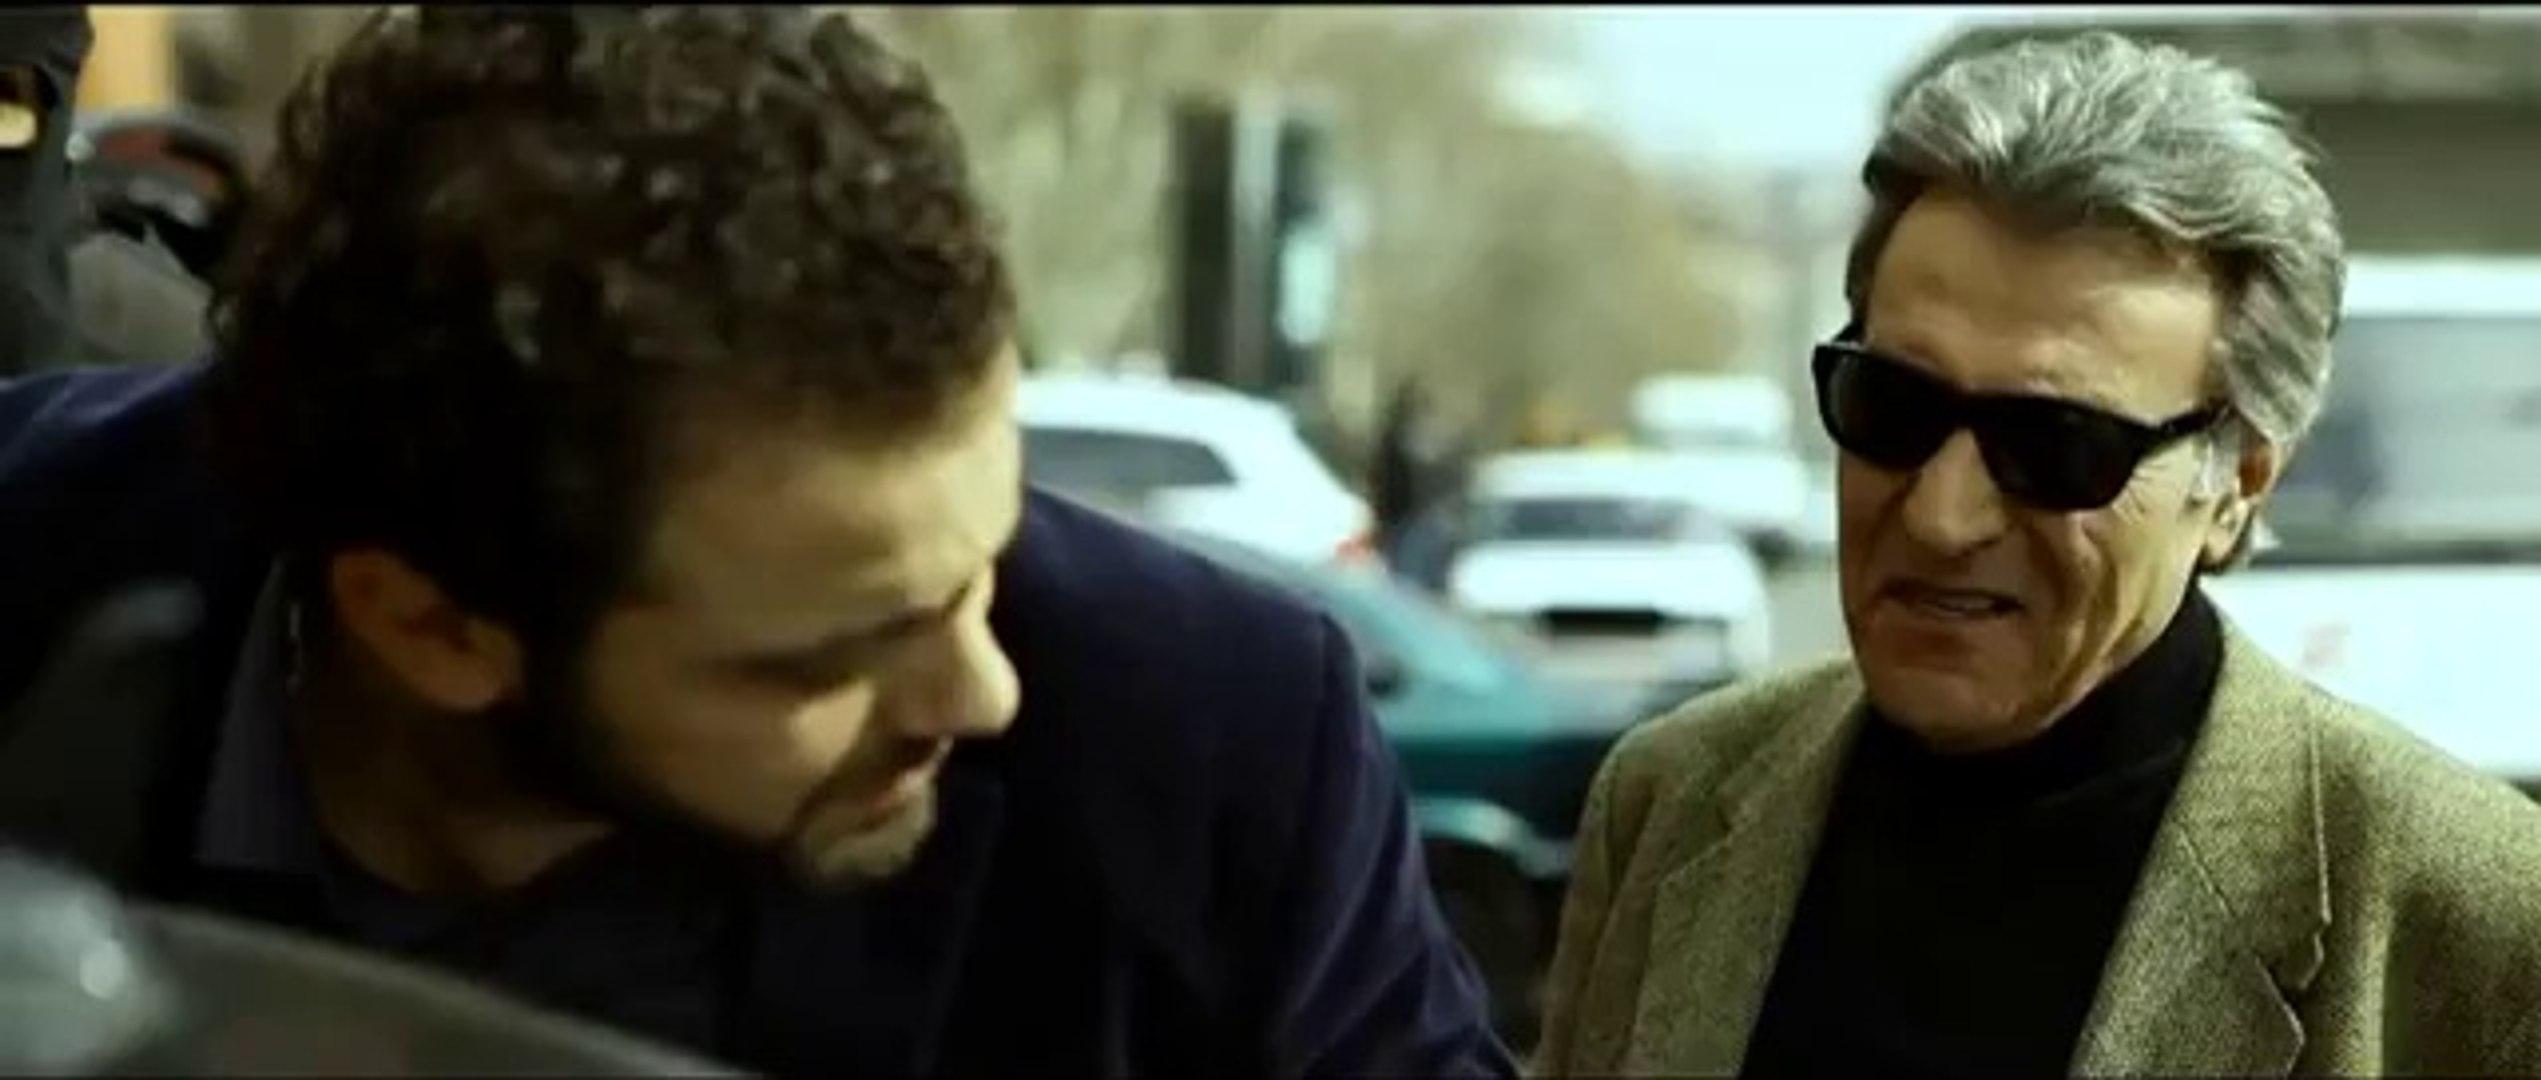 Смотреть онлайн армянский сериал Xaghic durs_19